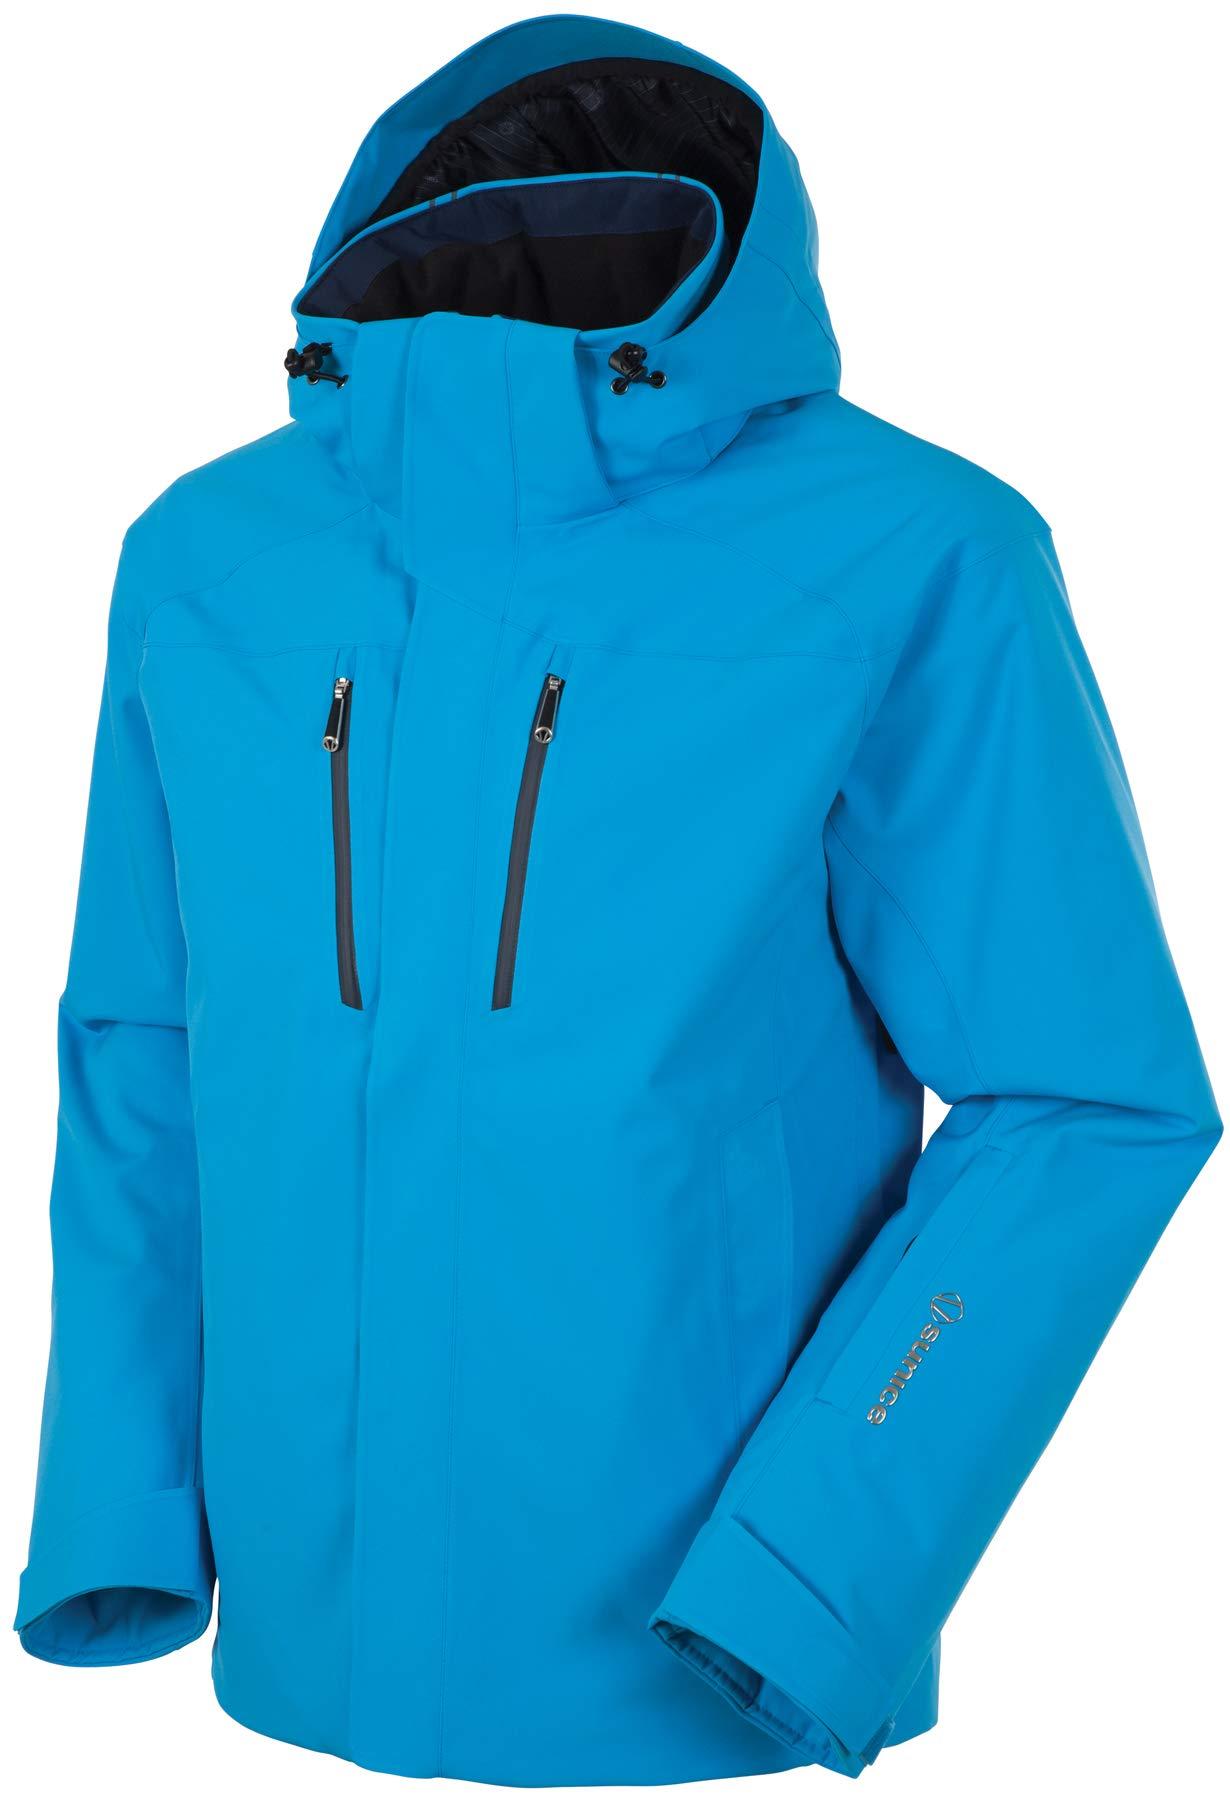 Sunice Vibe Men's Thermal Snow Jacket – Insulated Waterproof Winter Jacket